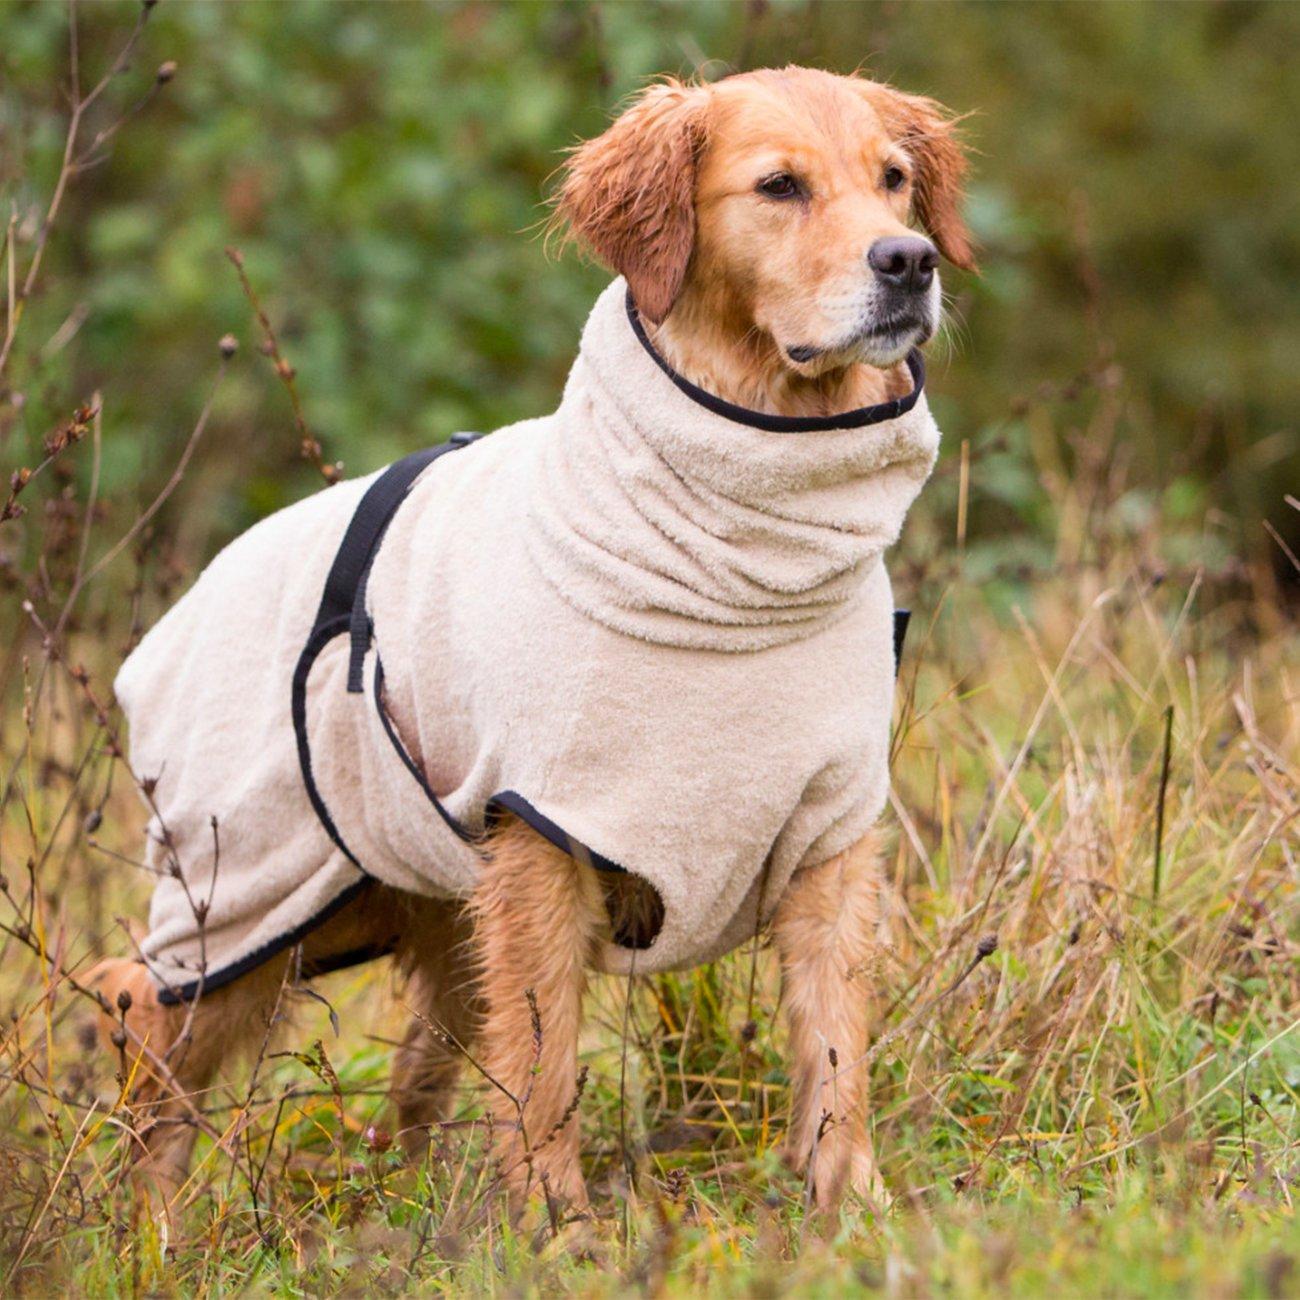 fit4dogs Trockenmantel Hund Dryup Cape, Bild 19